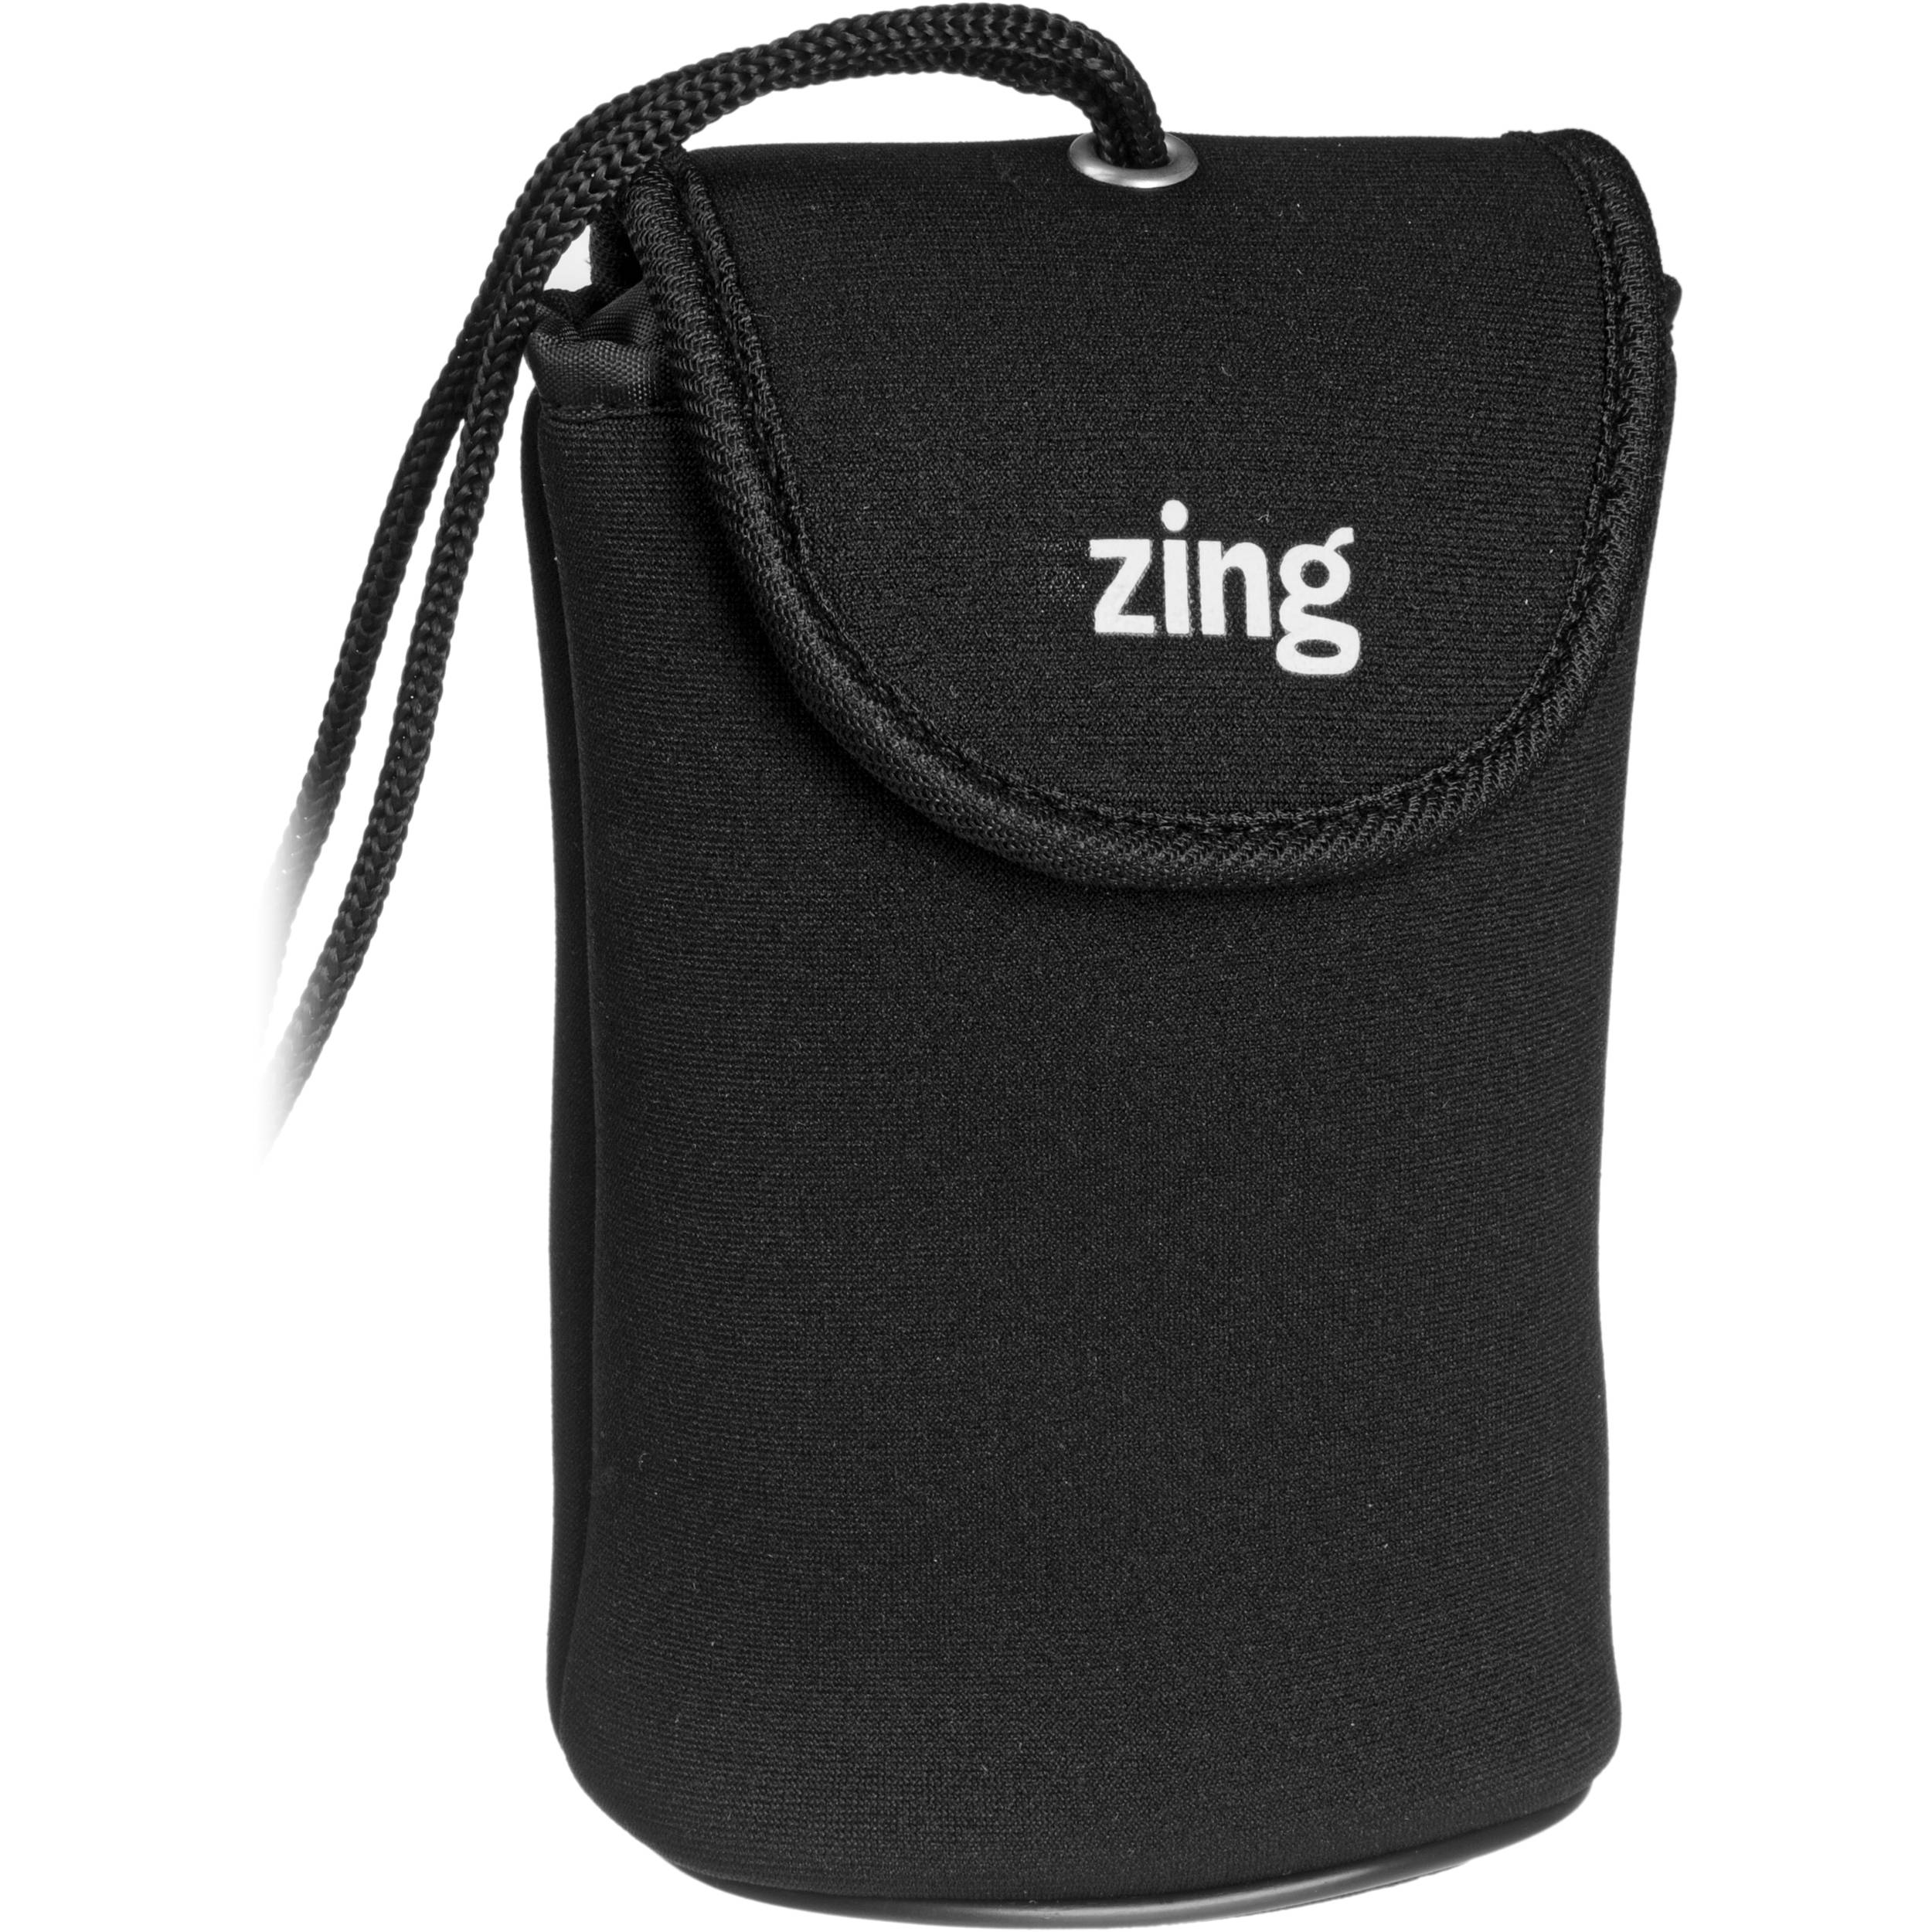 zing - photo #24